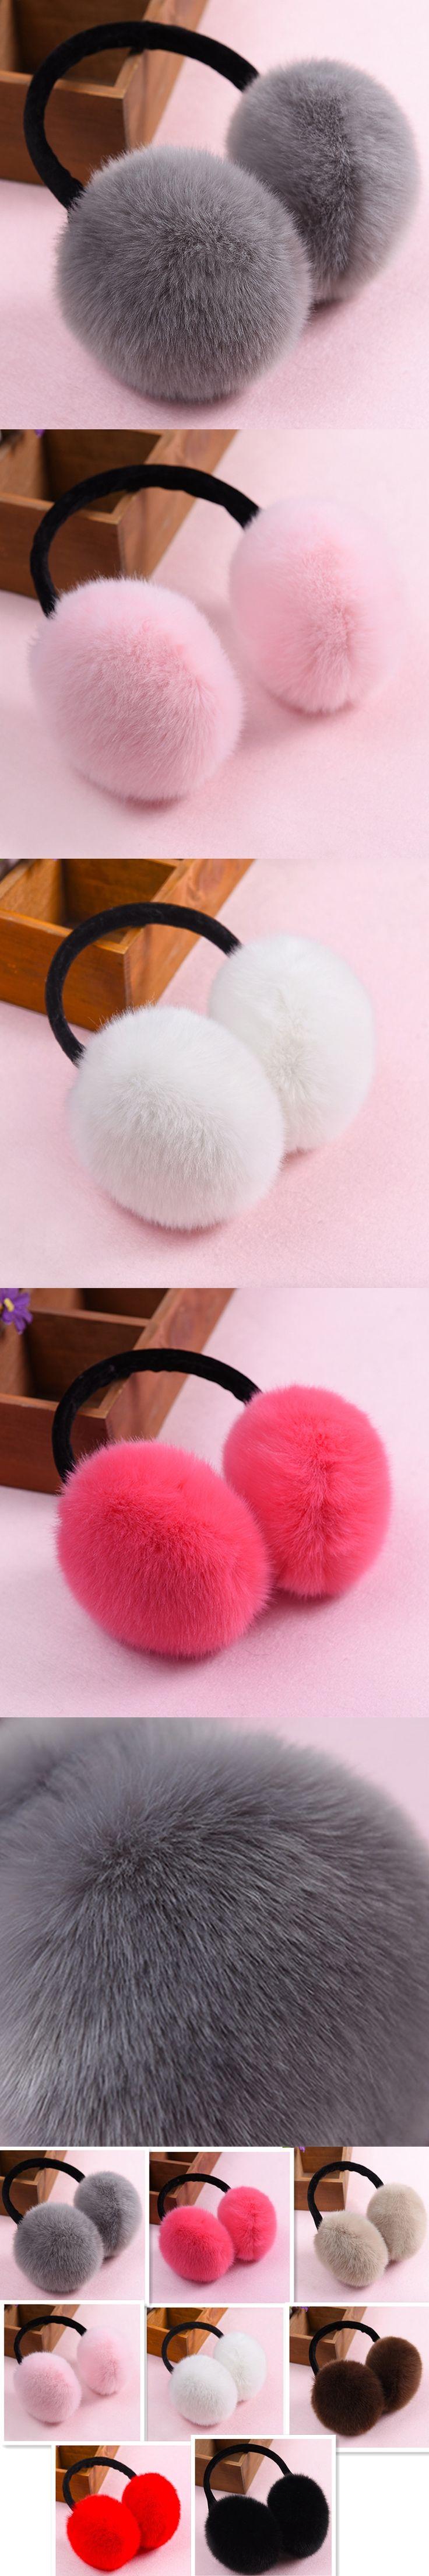 BONJEAN Fashion faux Rabbit Fur Women Earmuffs Winter fluffy plush Ear muffs warmers soft Warm Ear Cover Adjustable white black